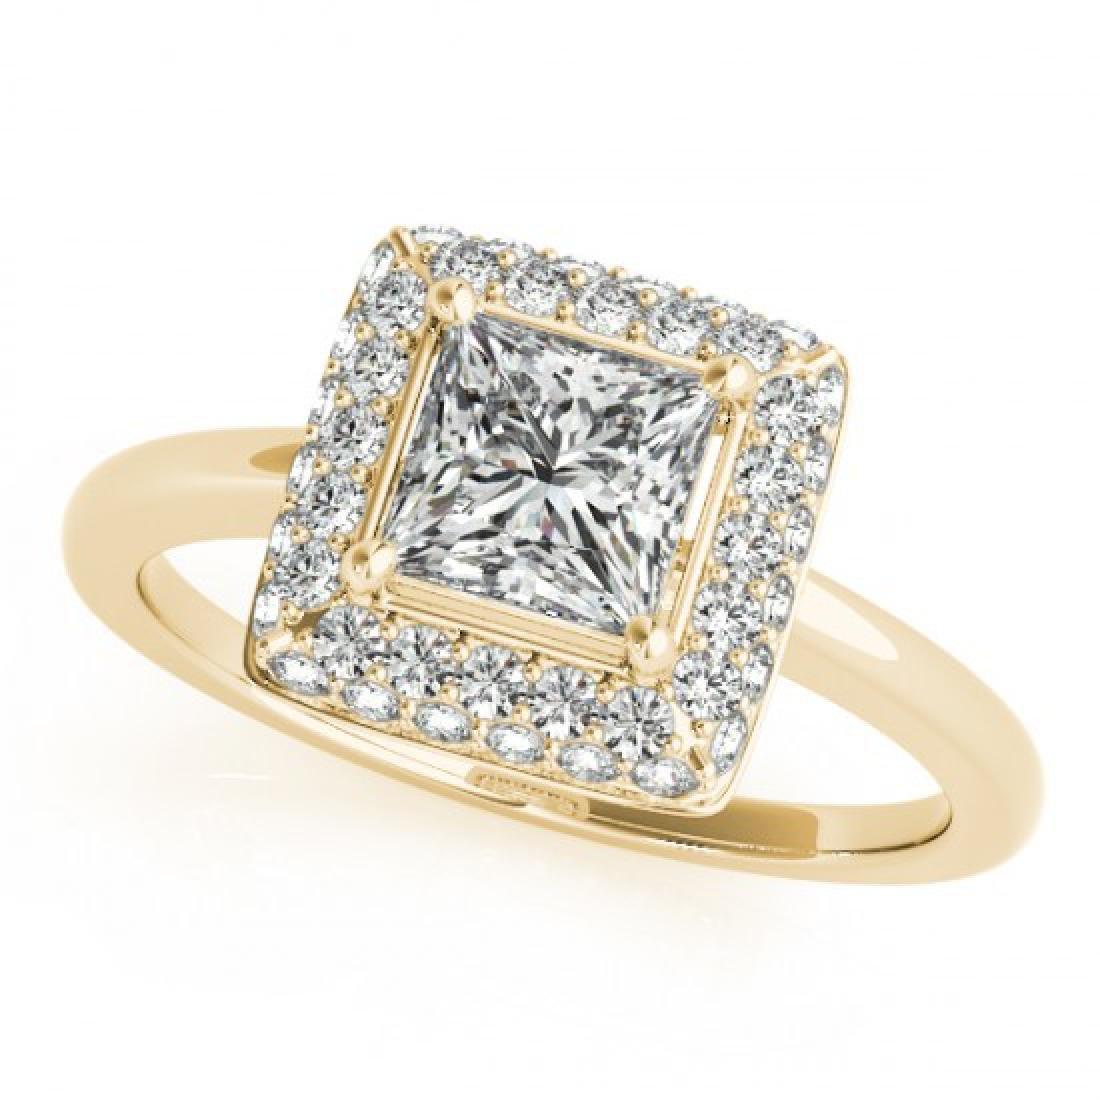 1.6 CTW Certified VS/SI Princess Diamond Solitaire Halo